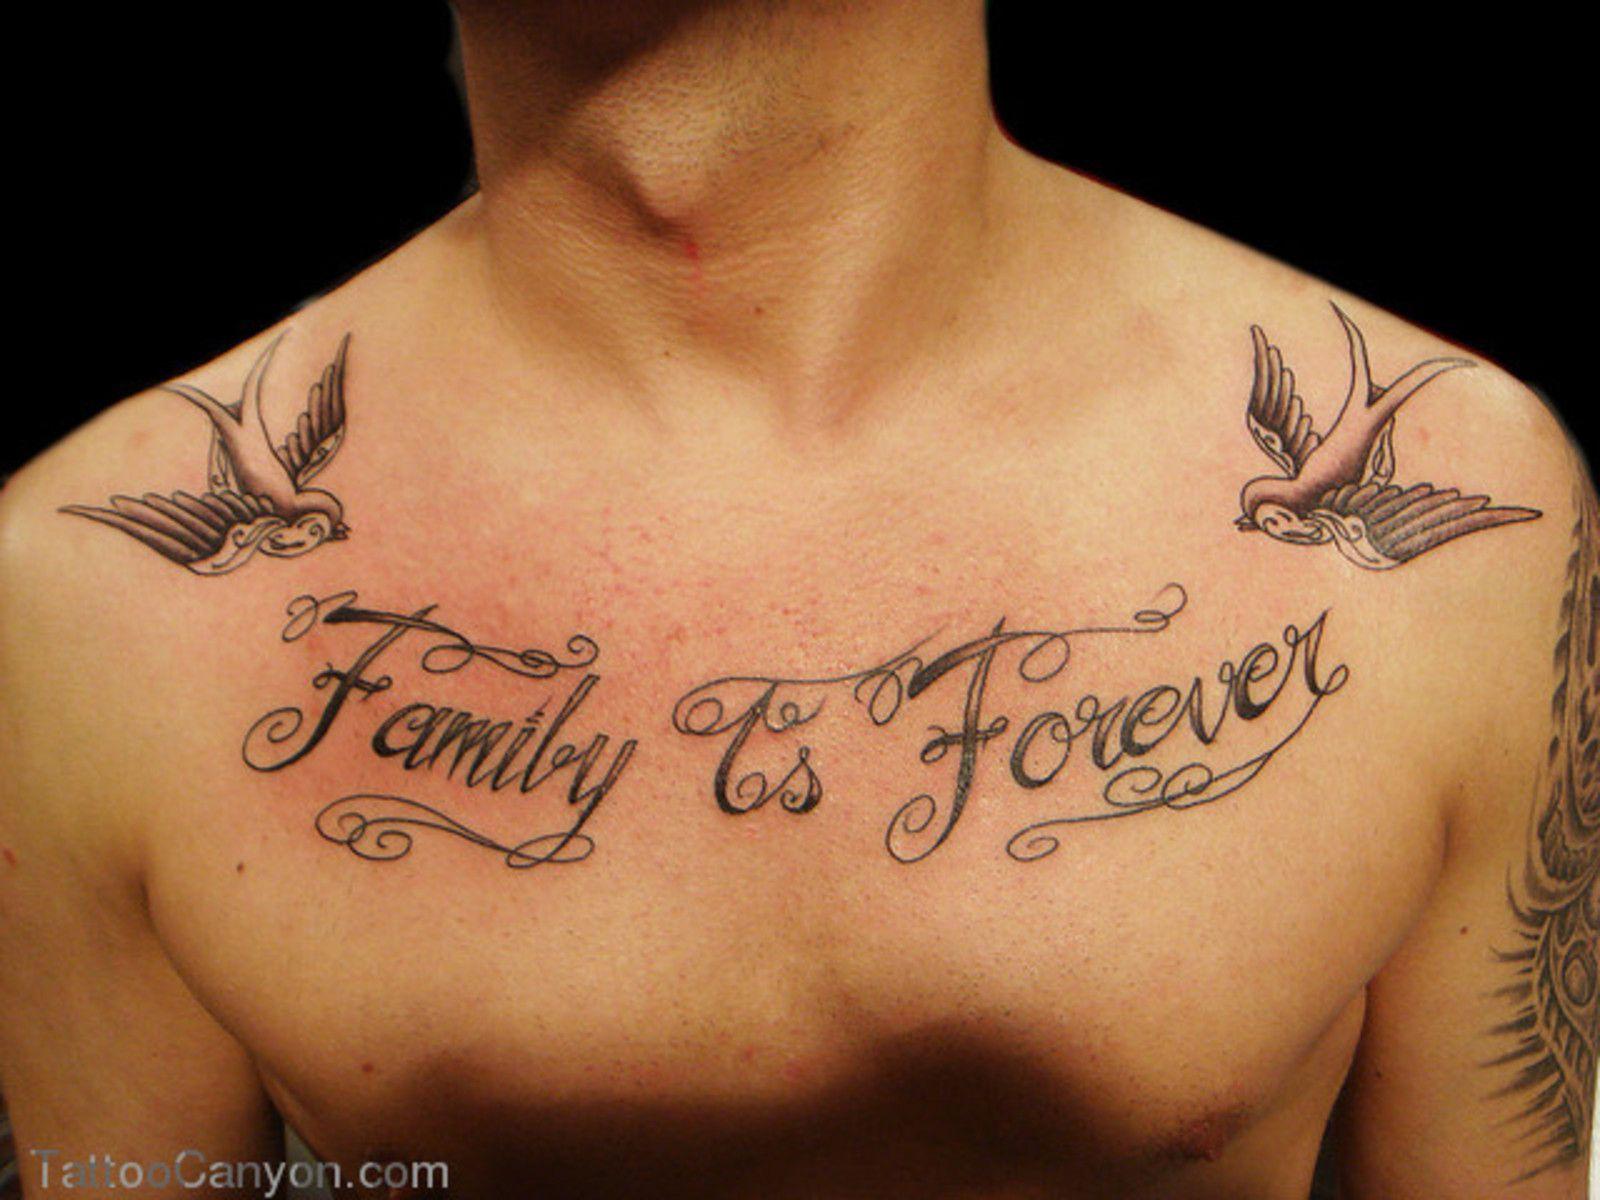 1493fb27e3cbb Family Quote Tattoo Designs Family is forever lettering #familytattoosformen